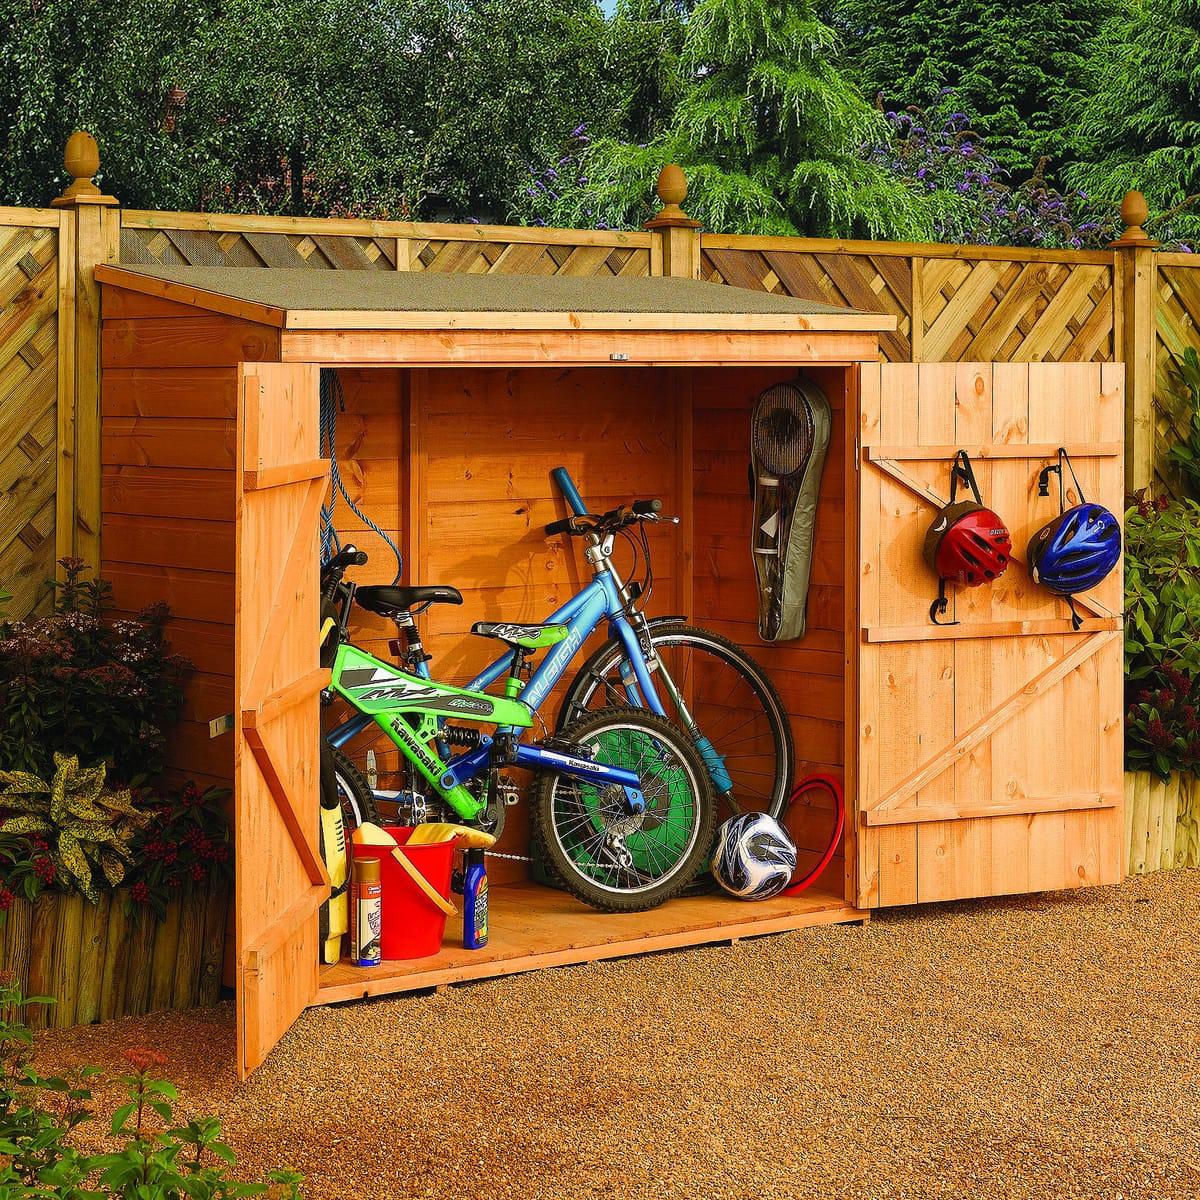 Construire Un Abri A Velo choisir son abri de jardin: le guide complet et nos conseils